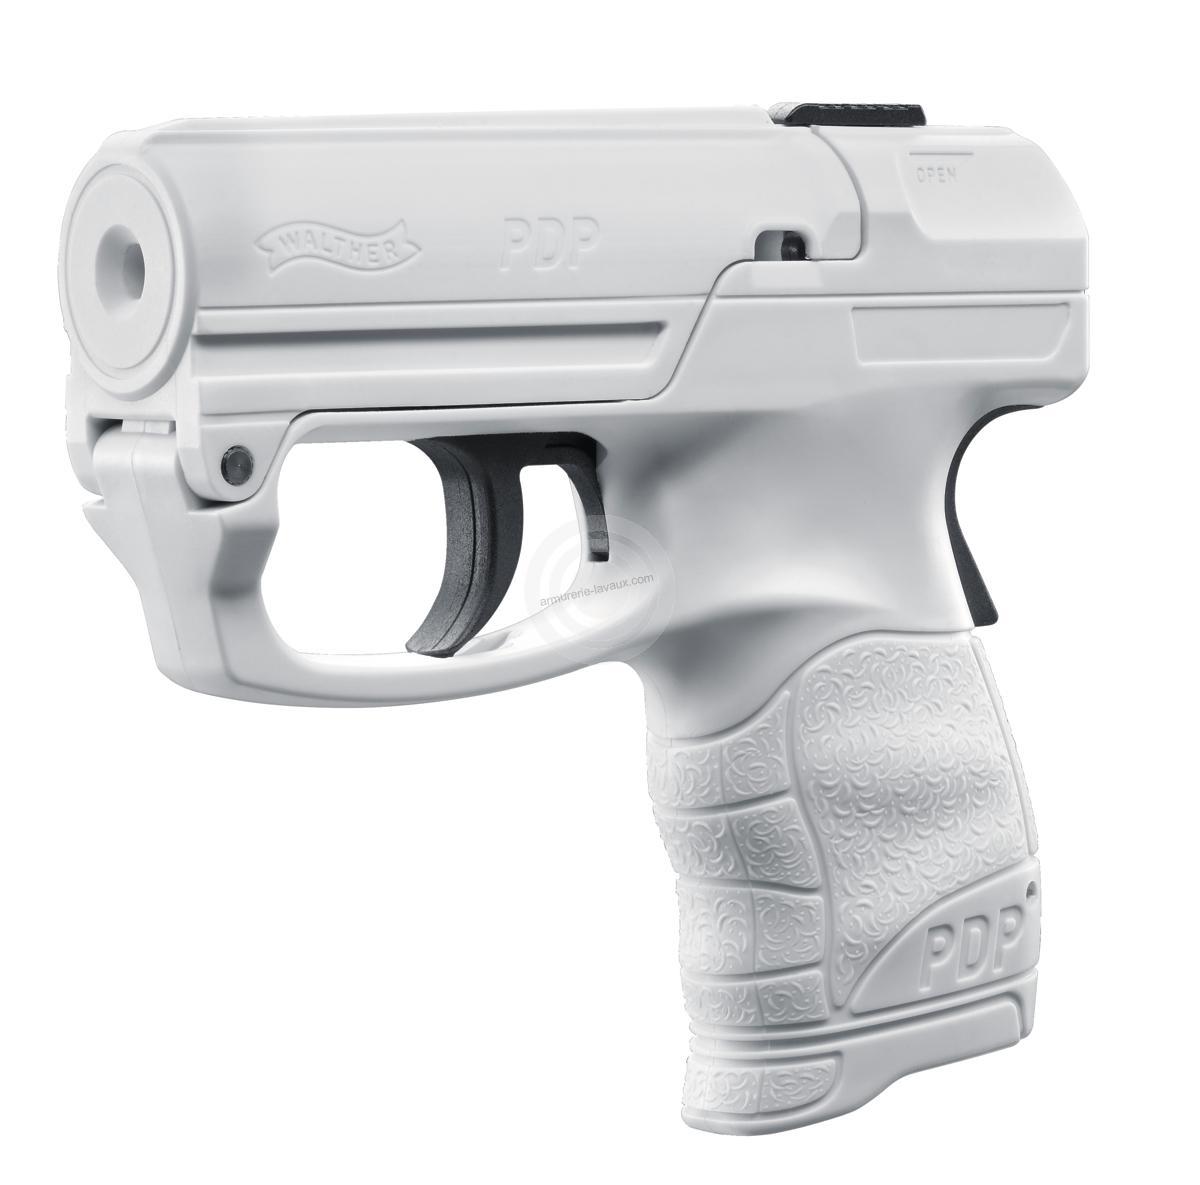 Pistolet lacrymogène WALTHER PDP Blanc